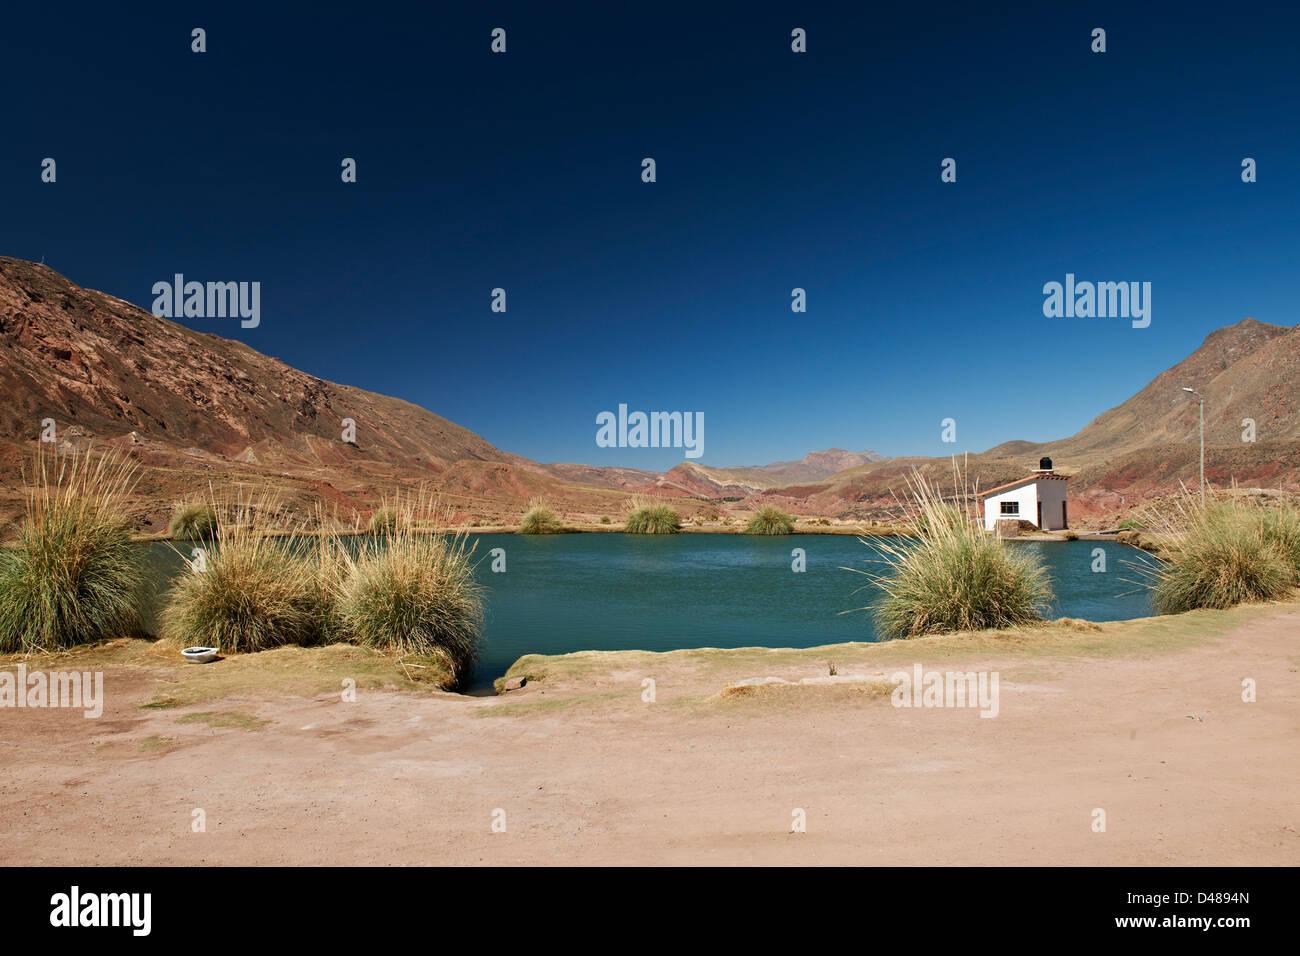 the hot spring El Ojo del Inca, Potosi, Bolivia, South America - Stock Image